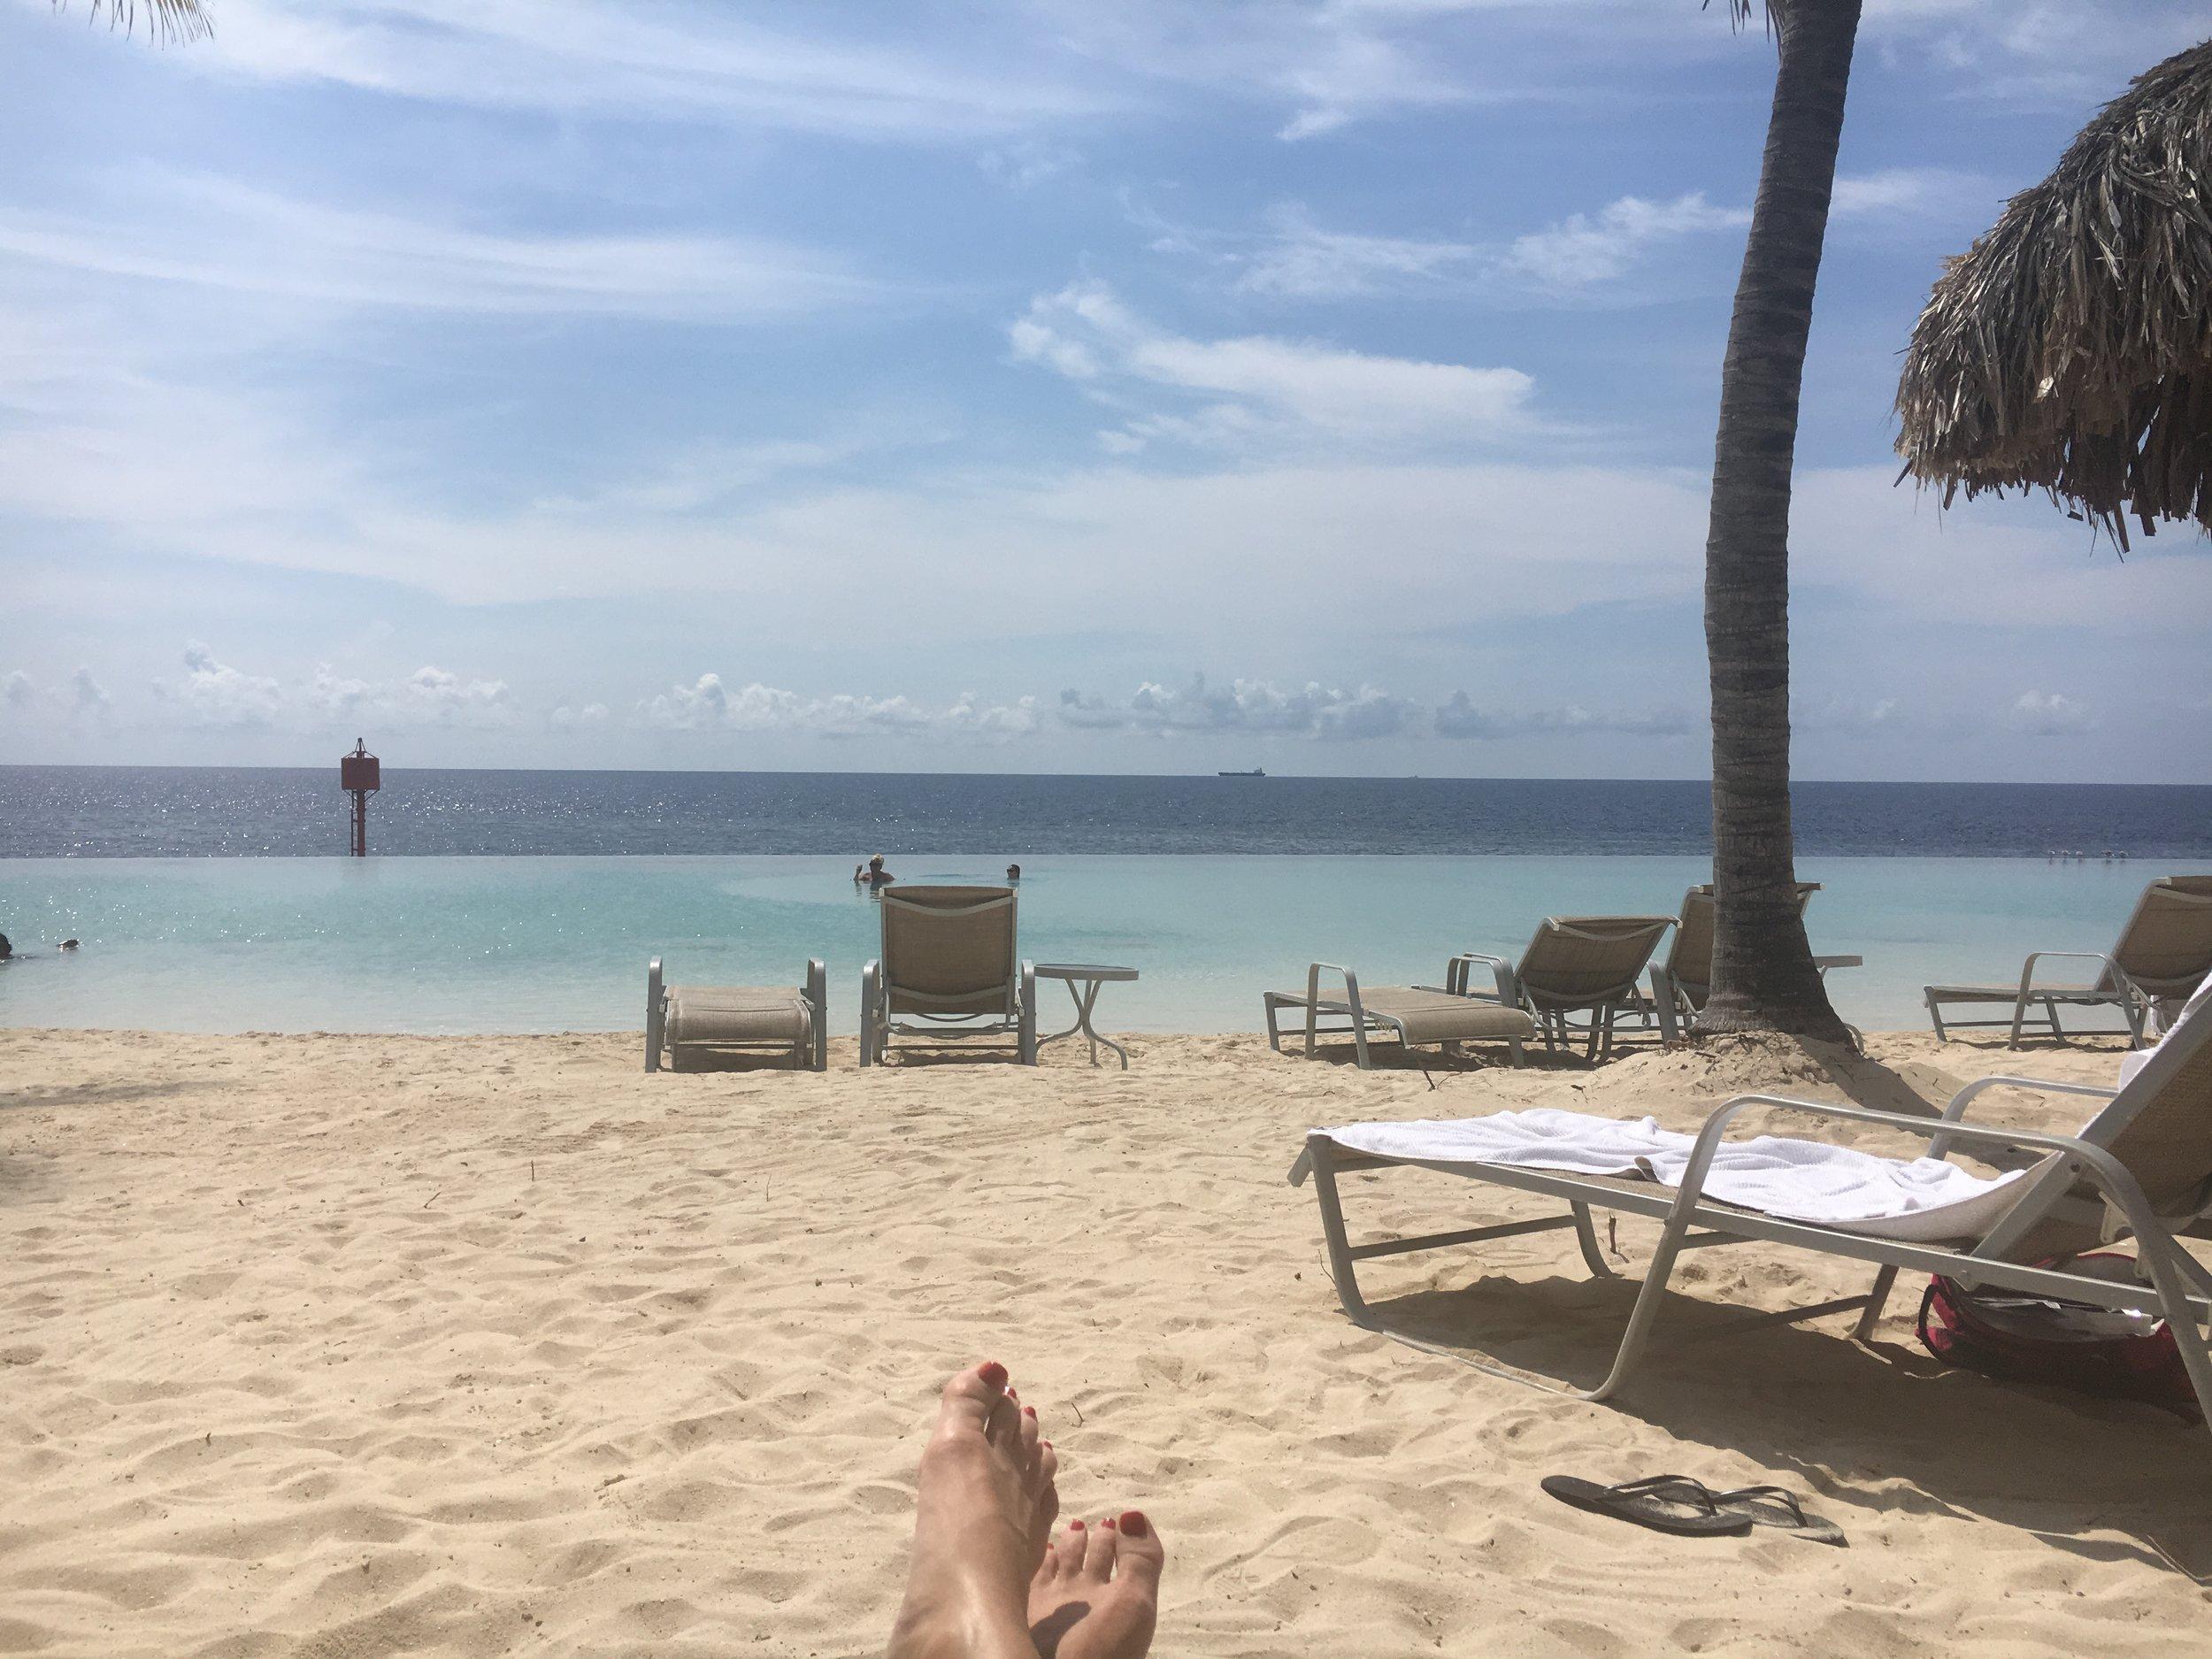 Renaissance infinity pool and beach